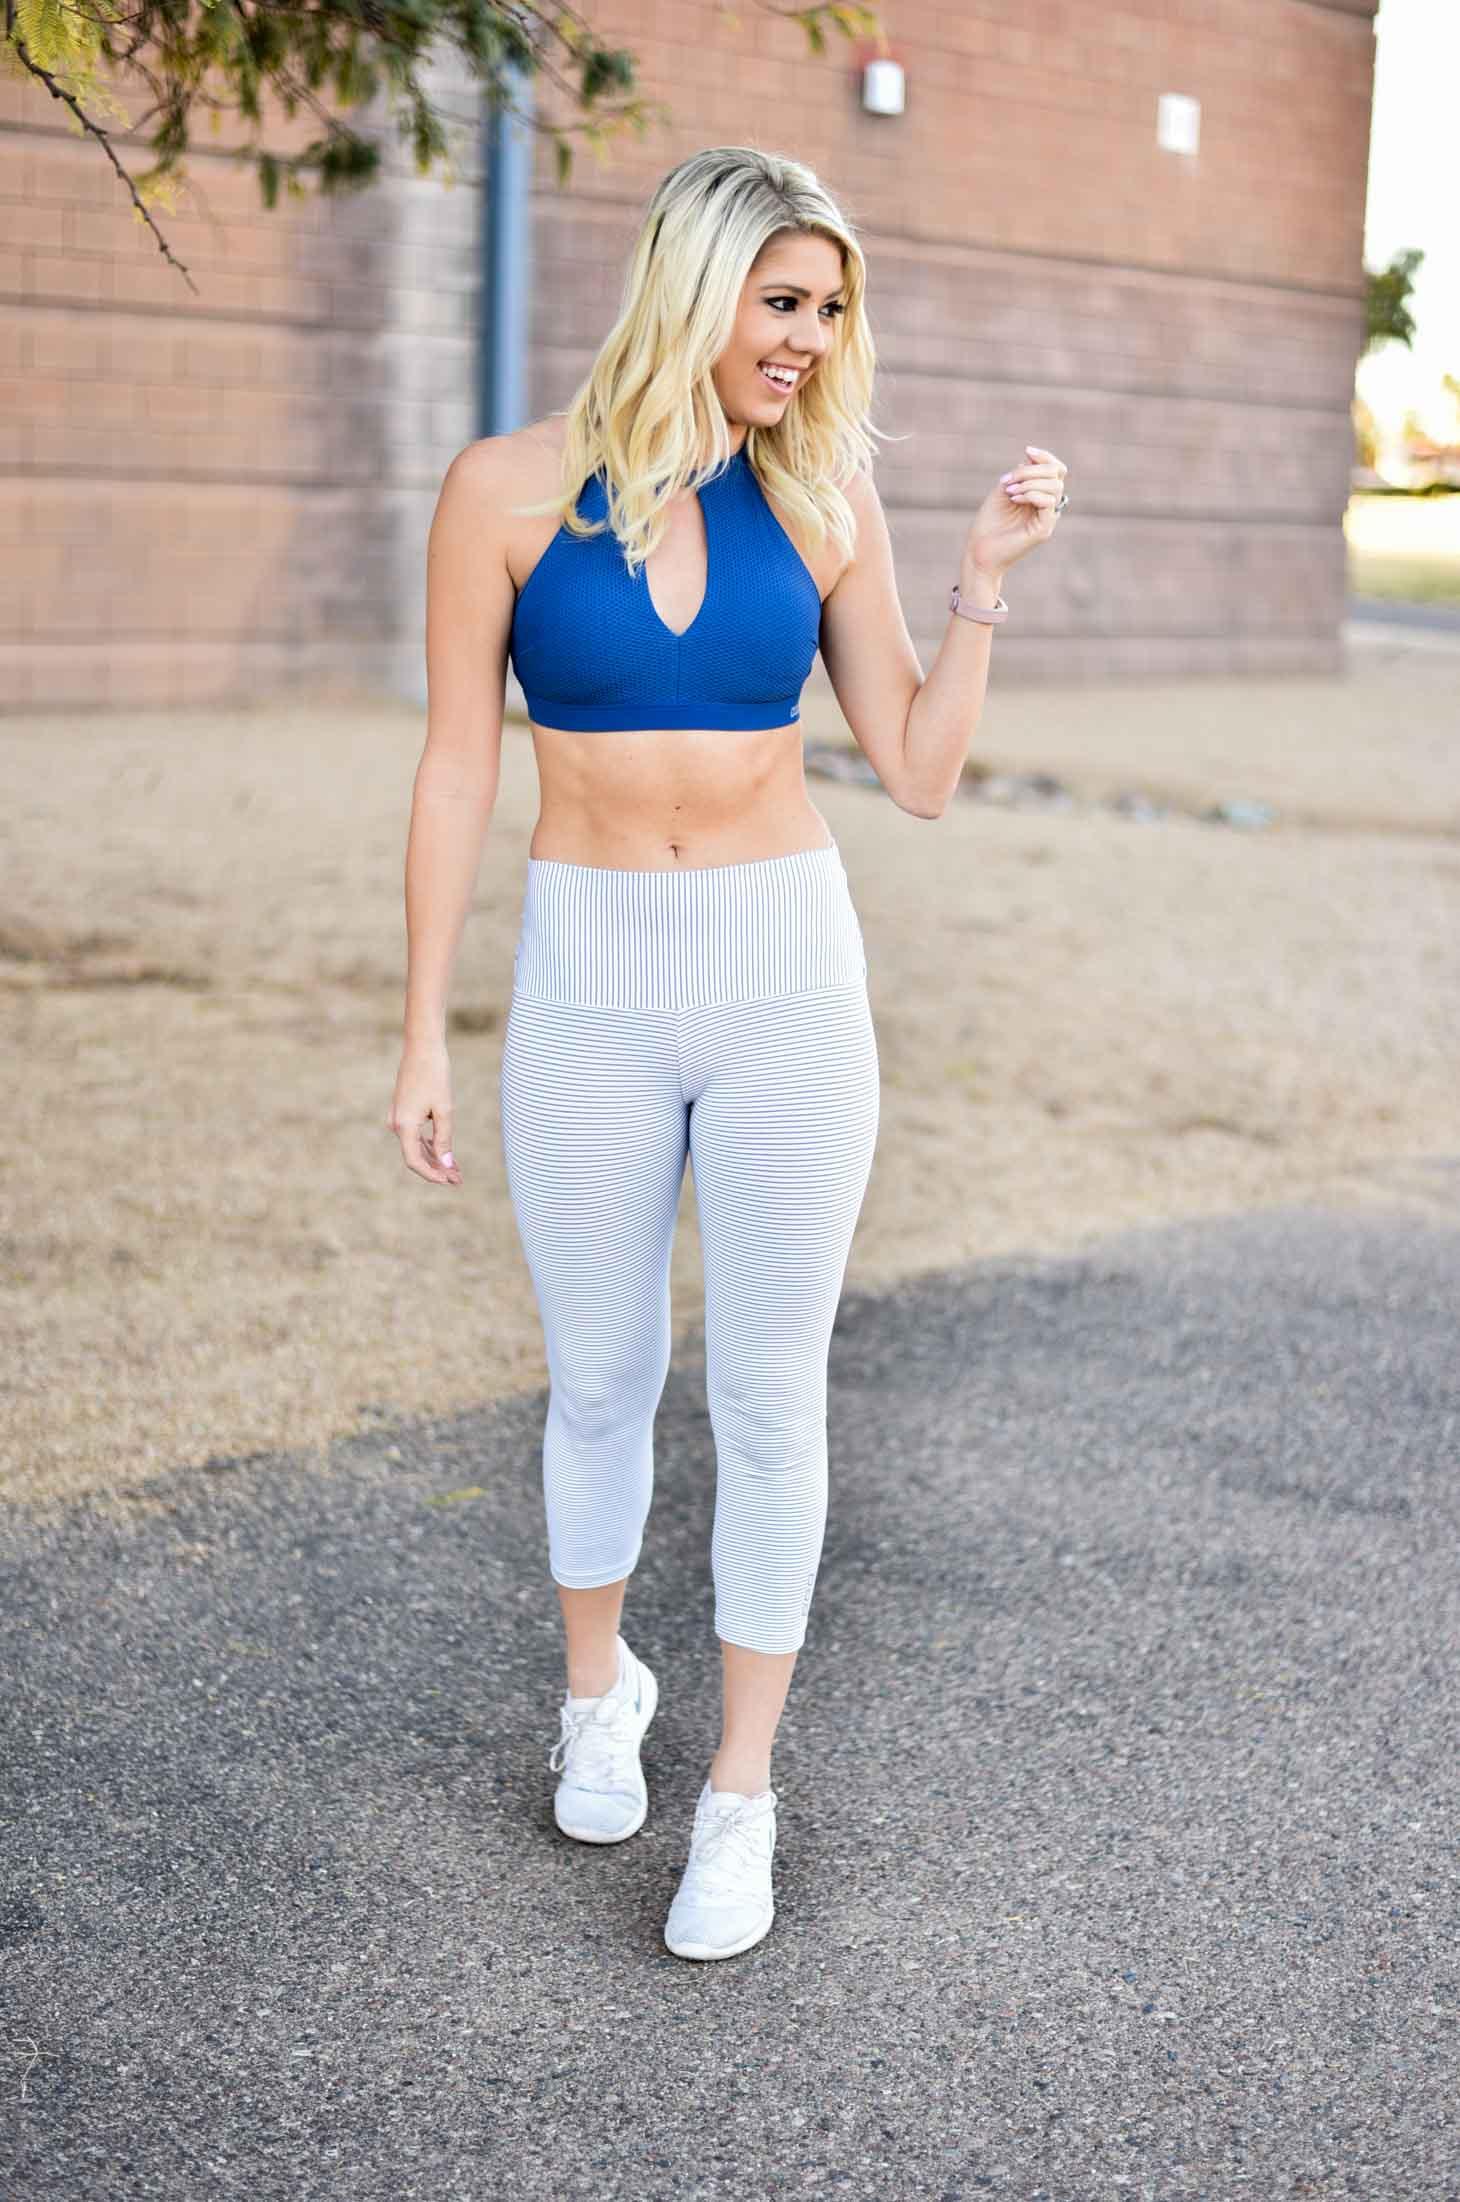 Erin Elizabeth of Wink and a Twirl in Lorna Jane Fitness Style